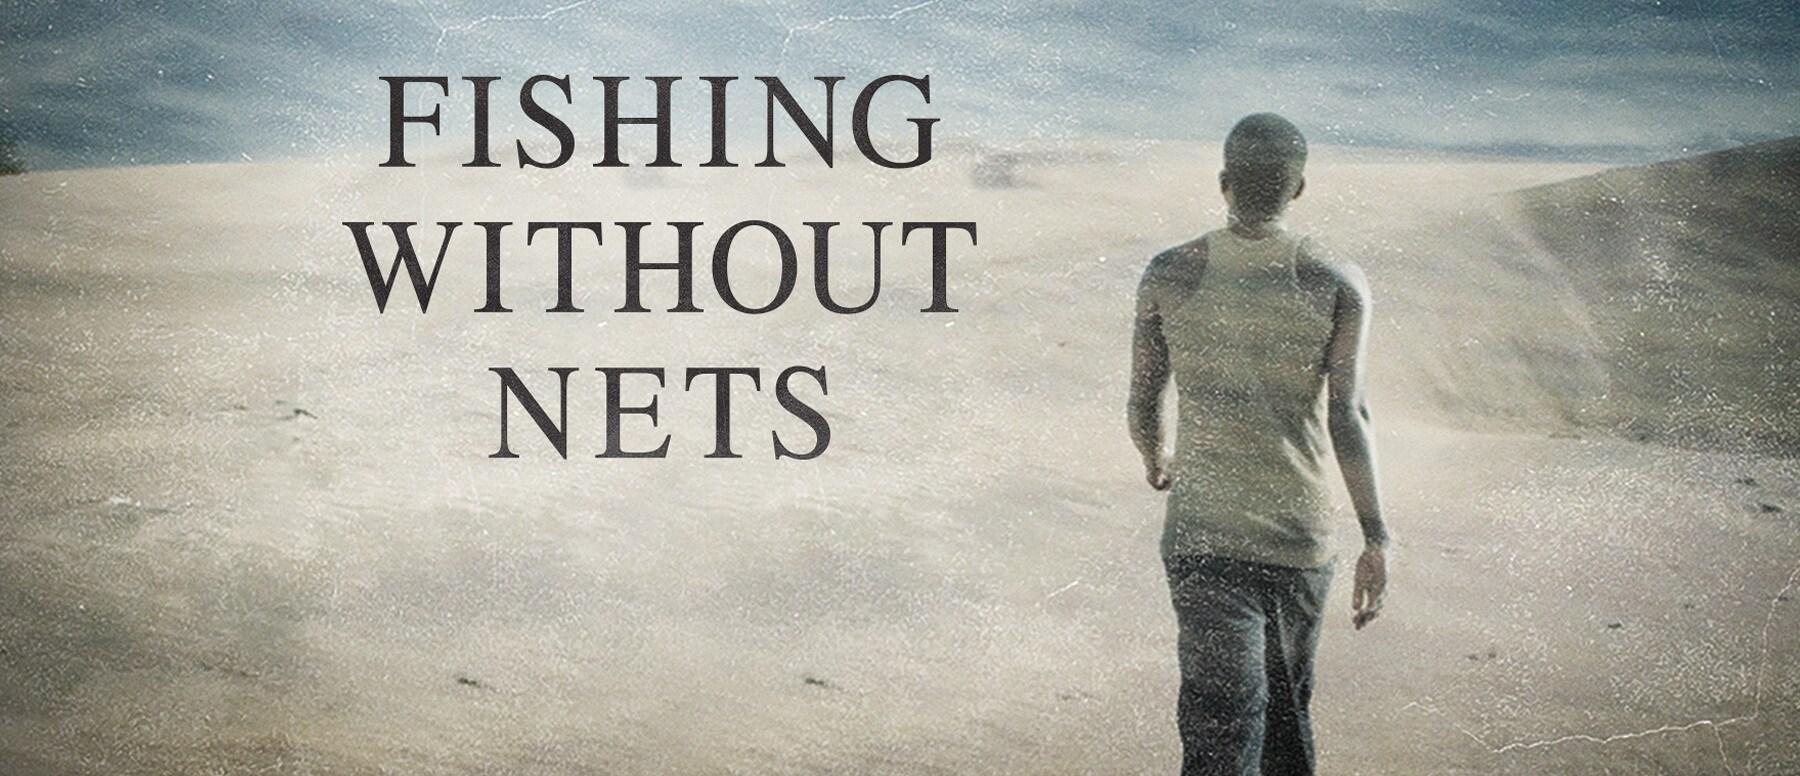 Fishing Without Nets Hero